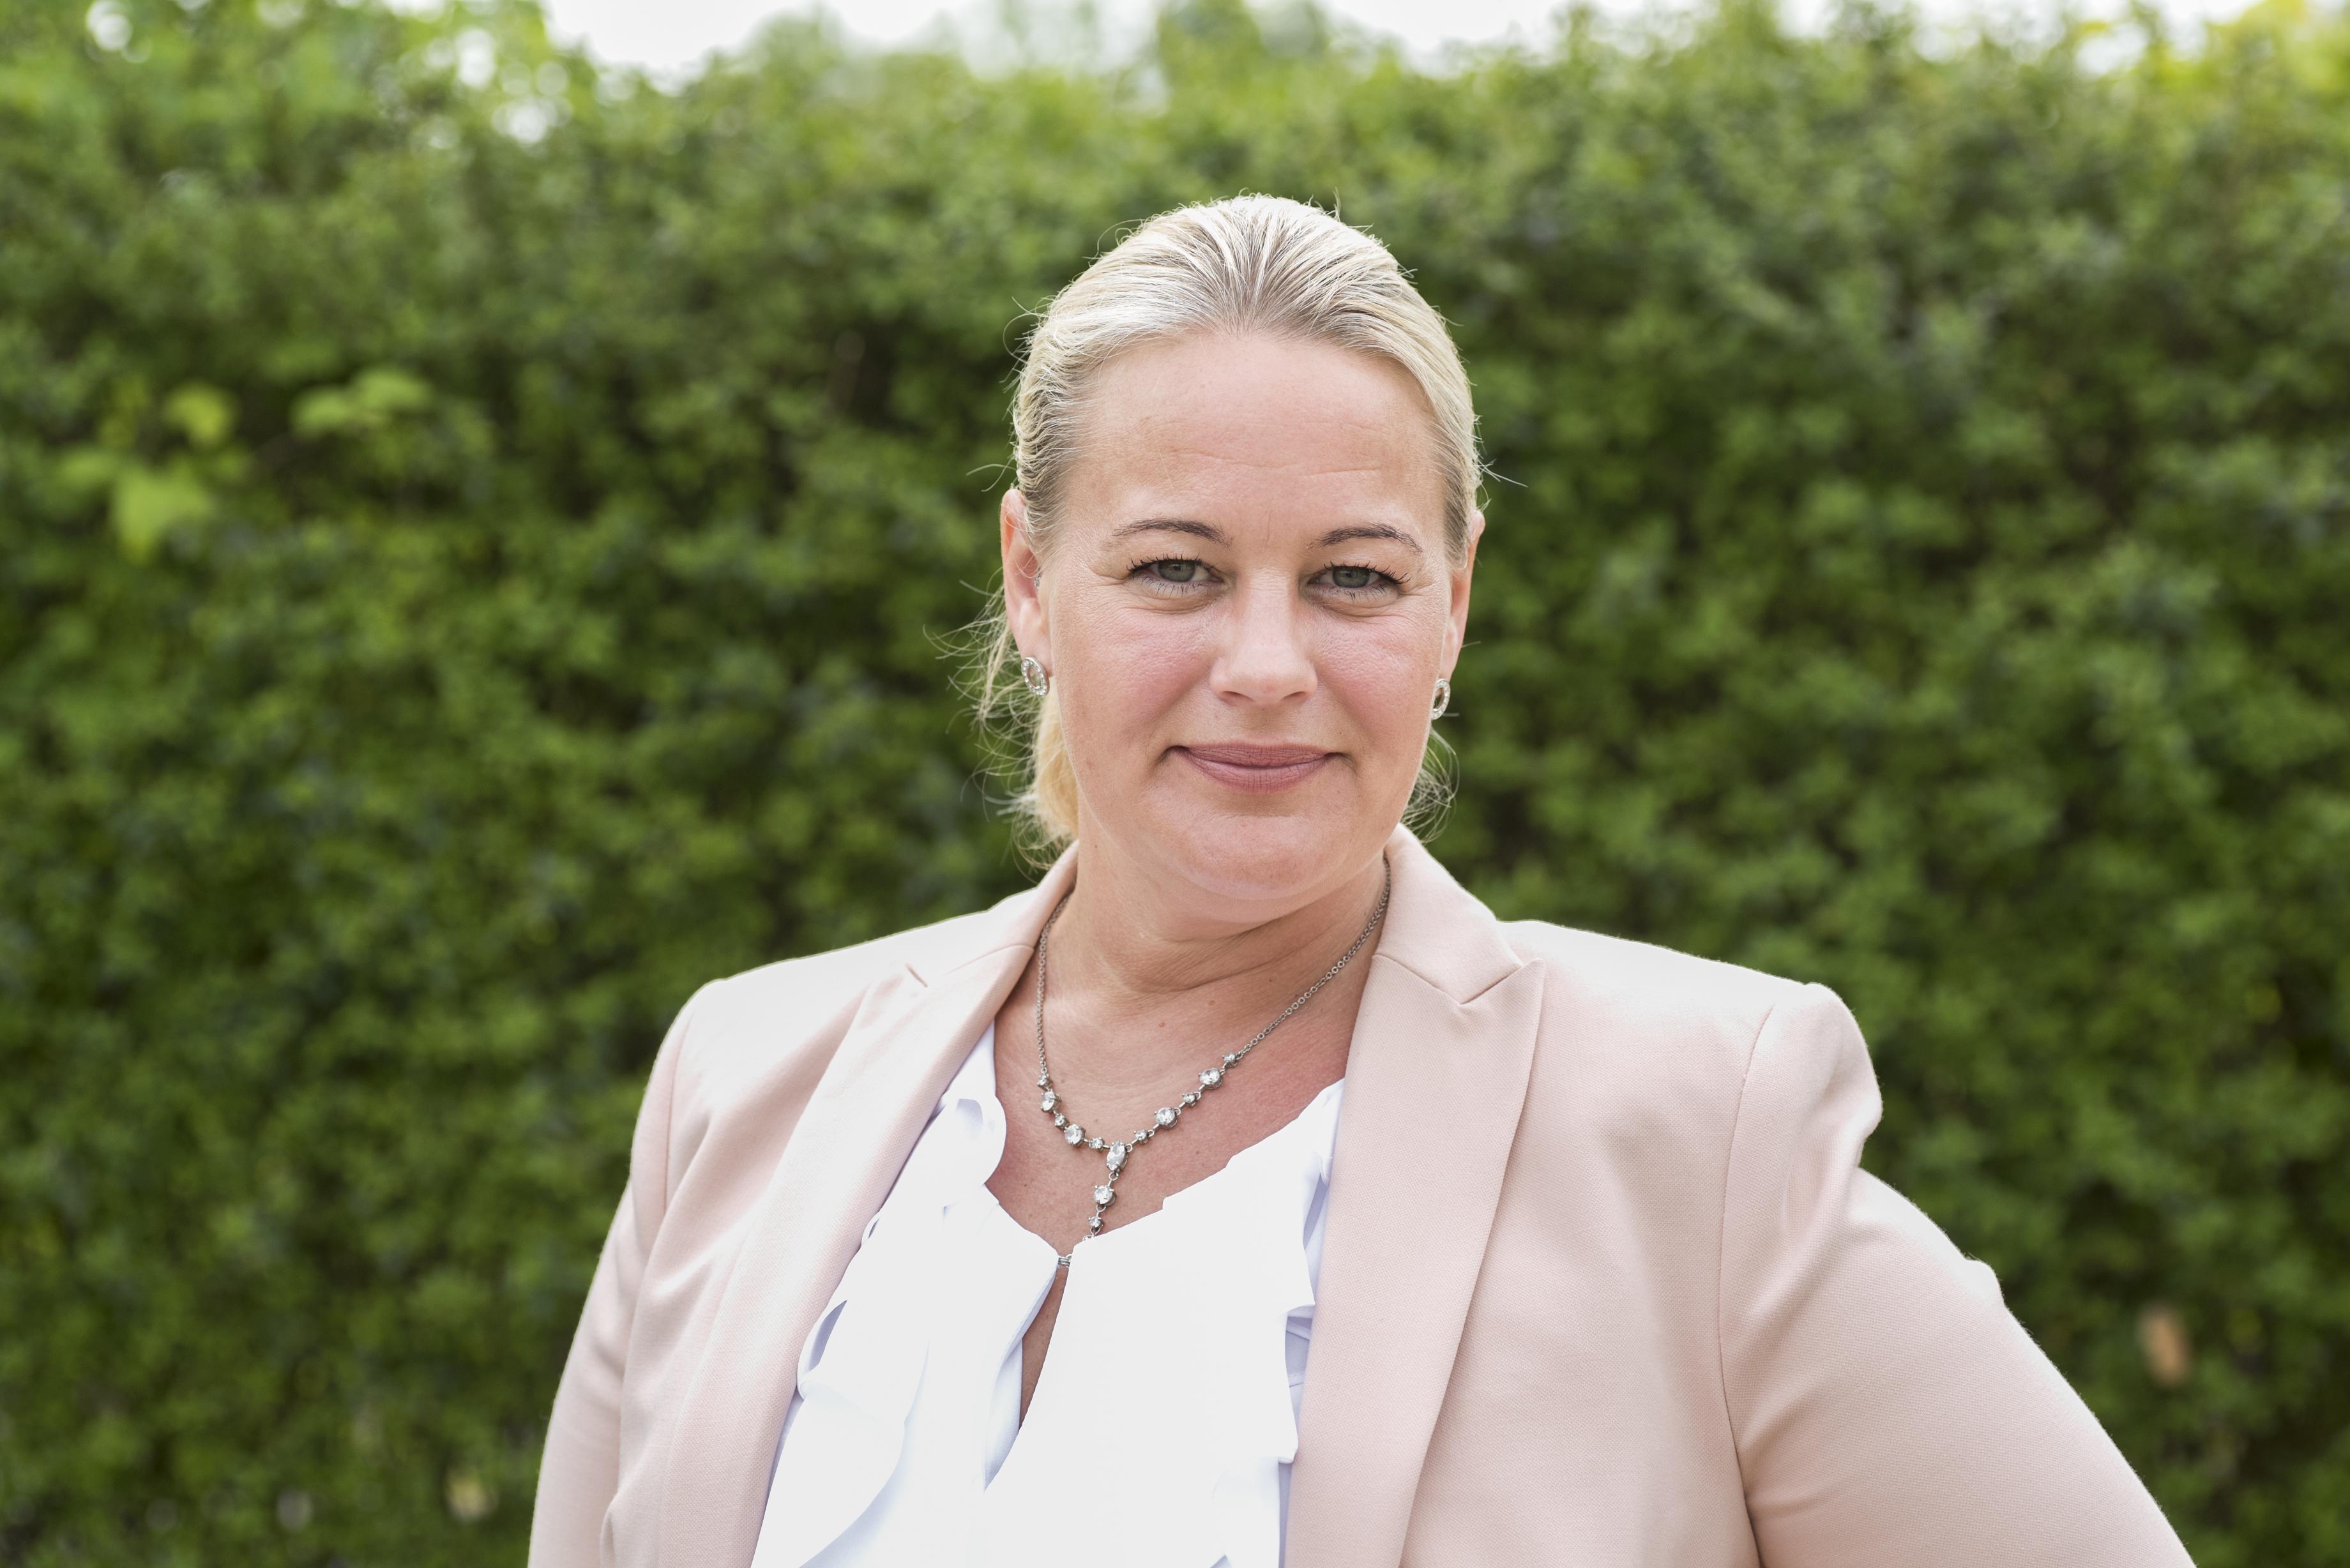 Ansvarig mäklare: Therese Tjernberg